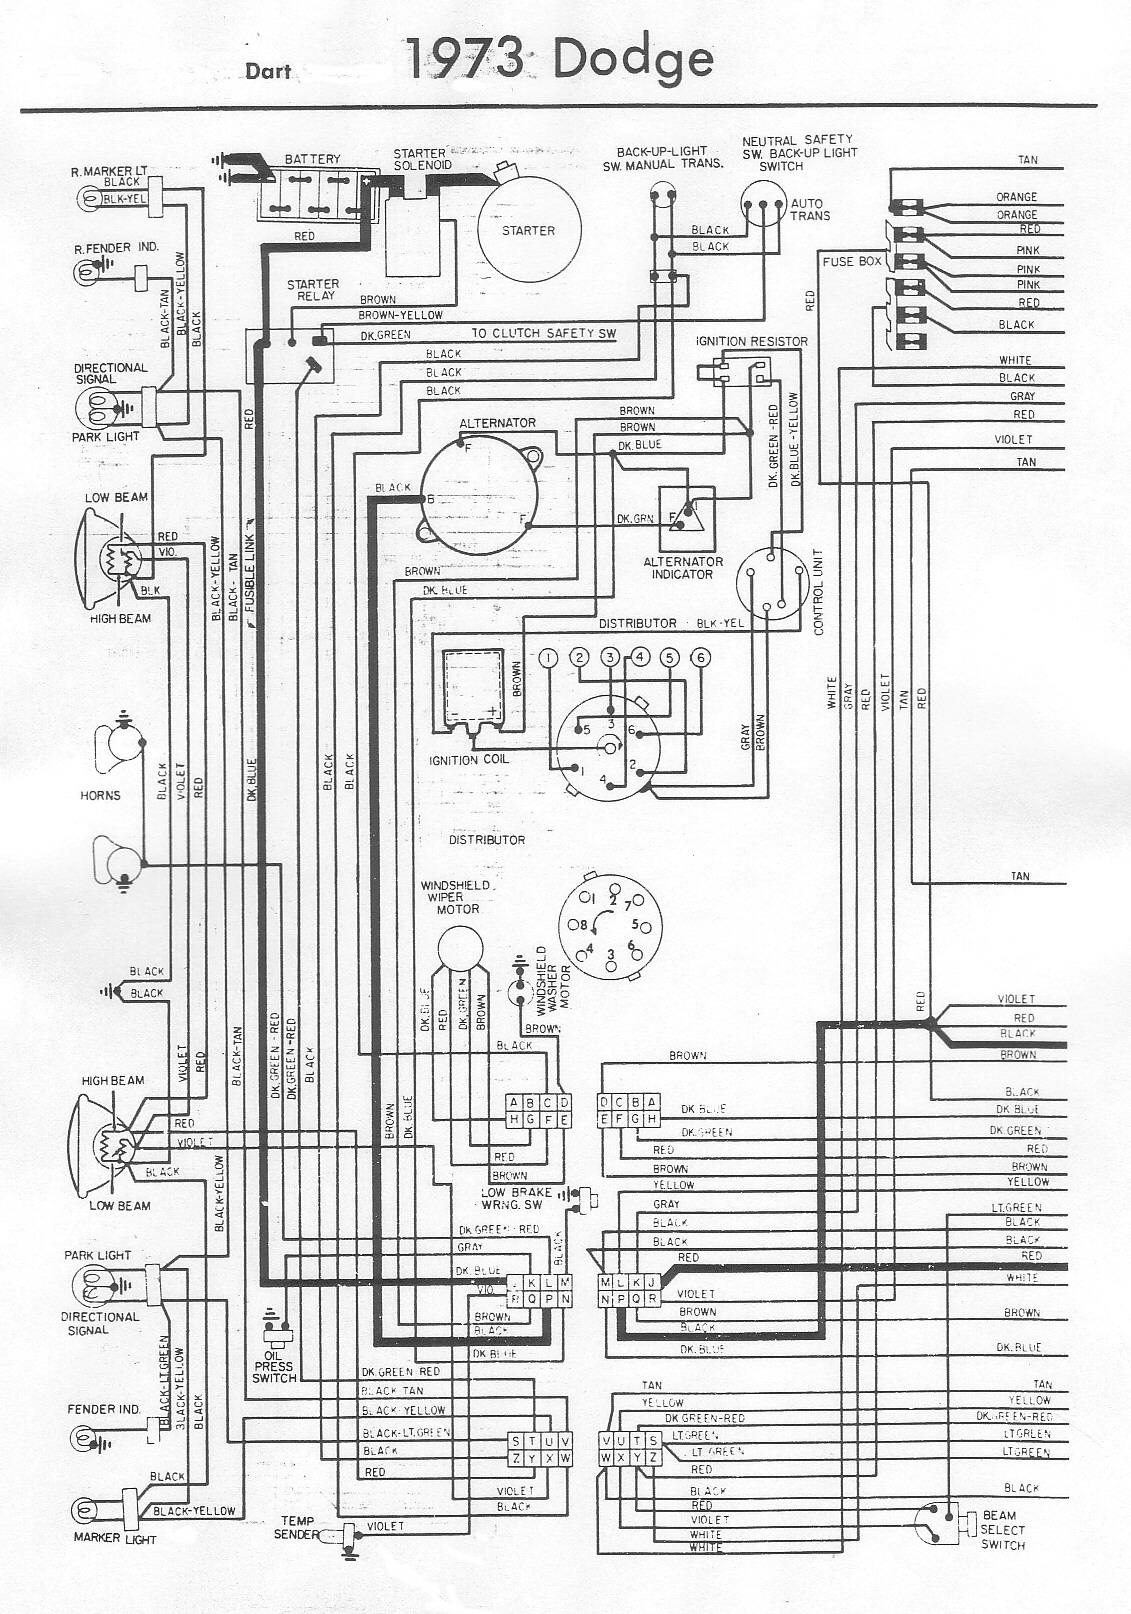 medium resolution of dodge dart wiring diagram wiring diagram advance 1969 dodge dart wiring diagram 1969 dodge wiring diagram